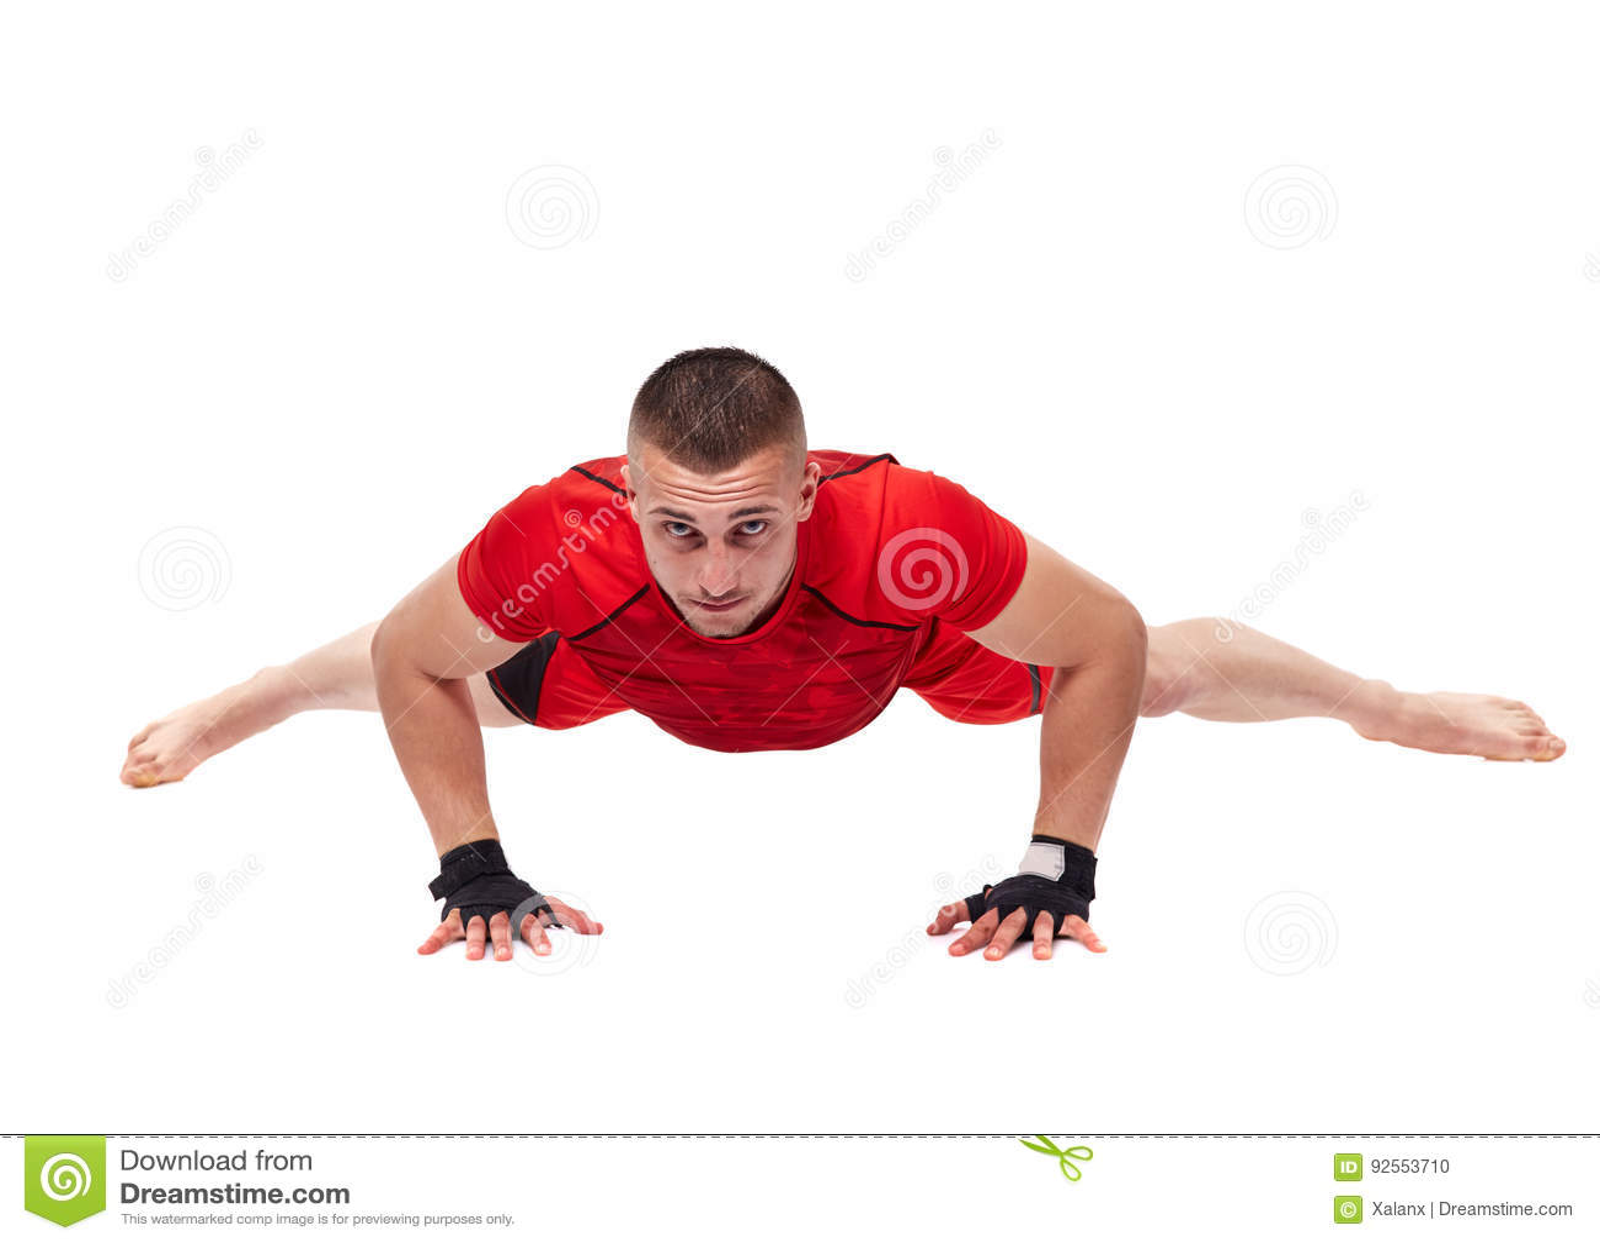 Kickbox fighter stretching